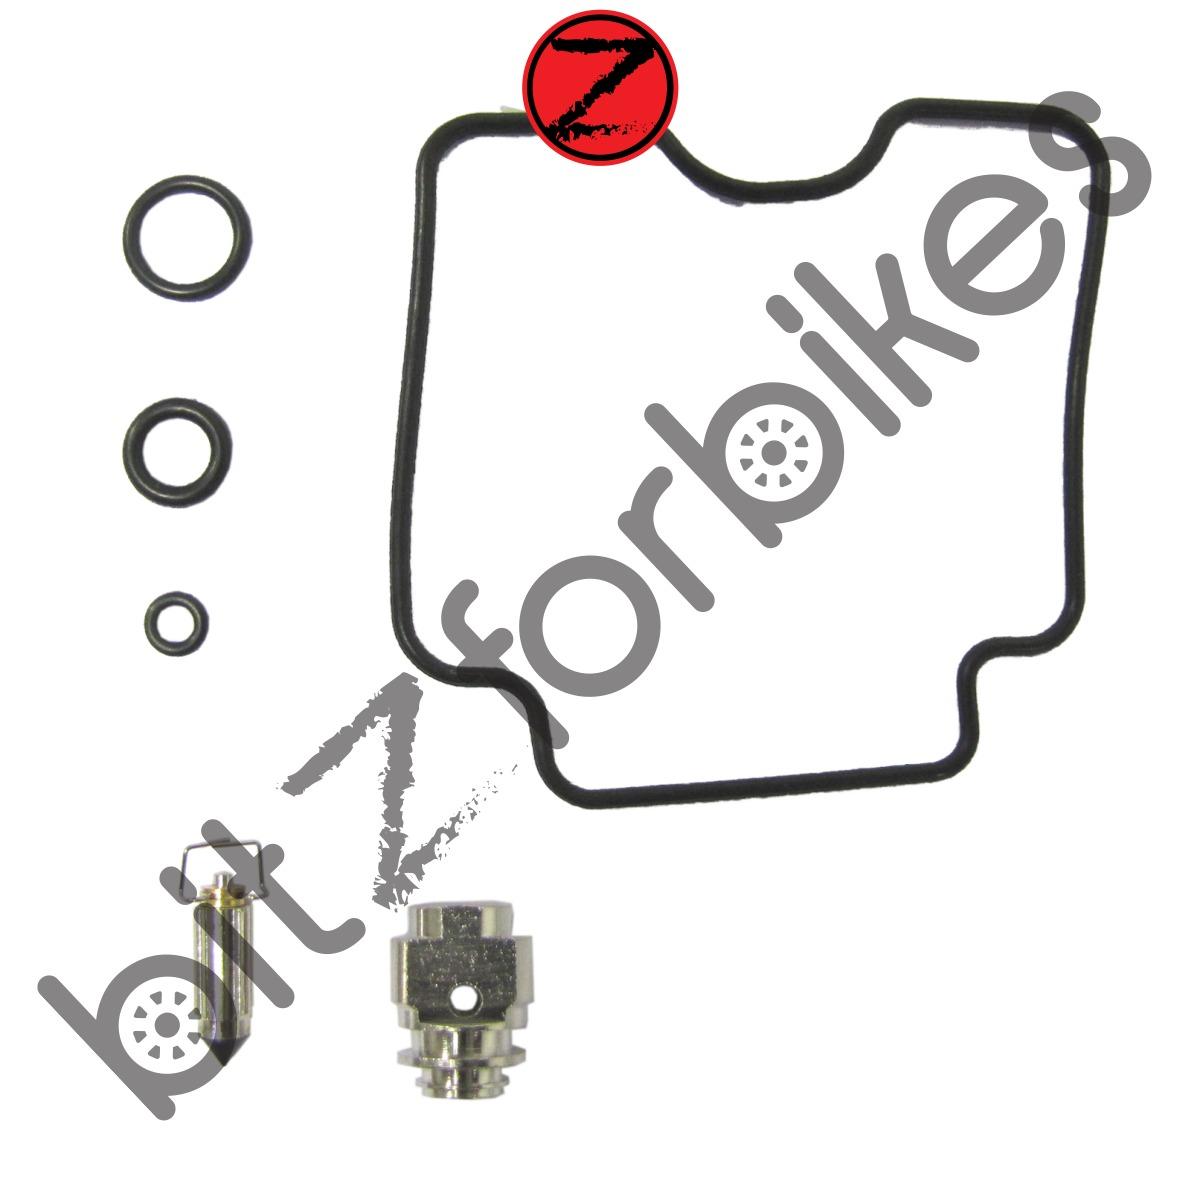 Carb Carburettor Repair Kit Yamaha Yxr 660 Fas Rhino Utv